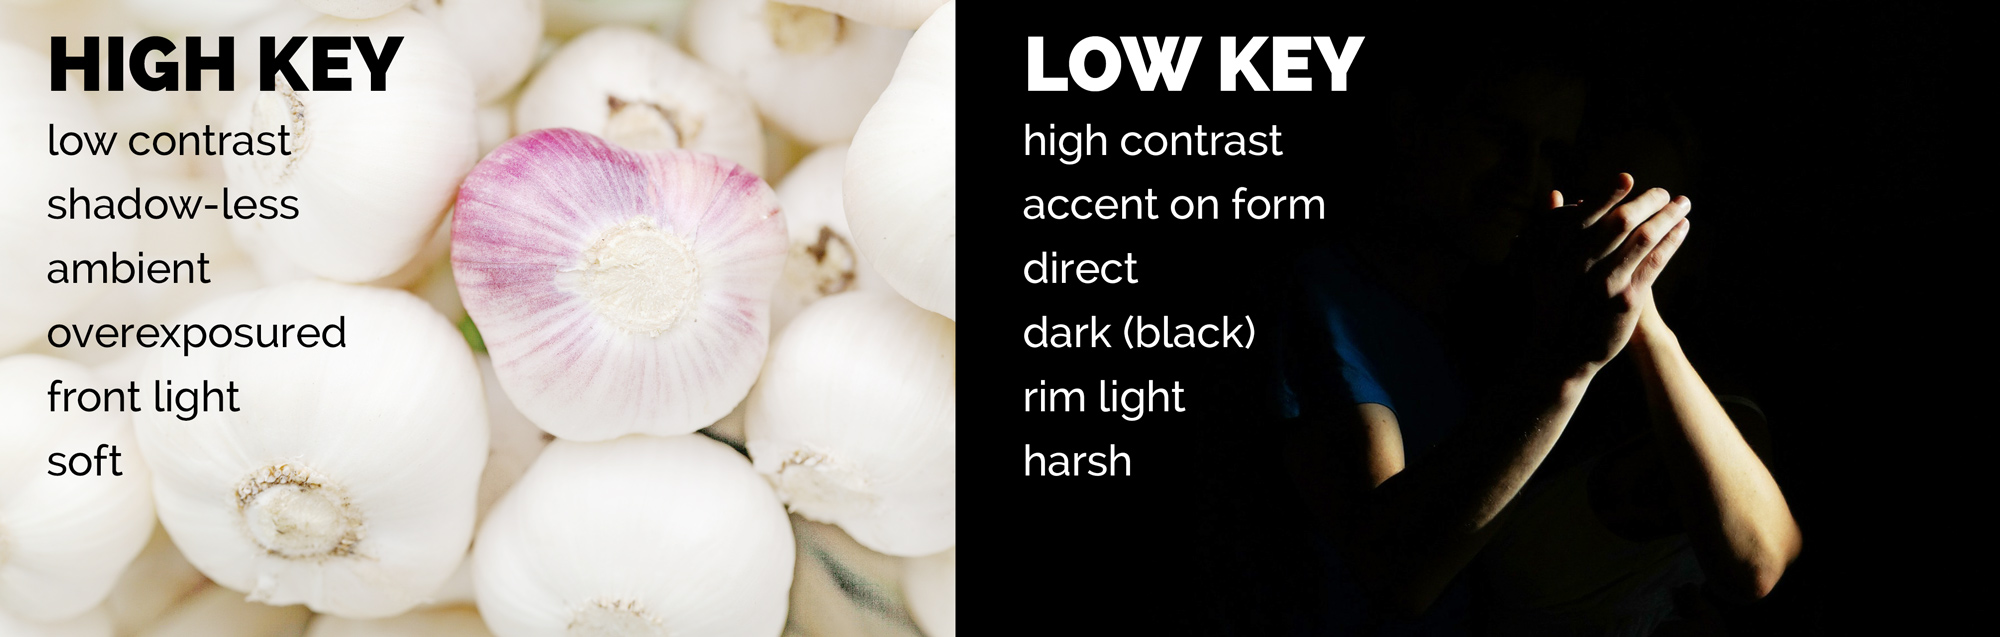 high key lighting vs low key lighting